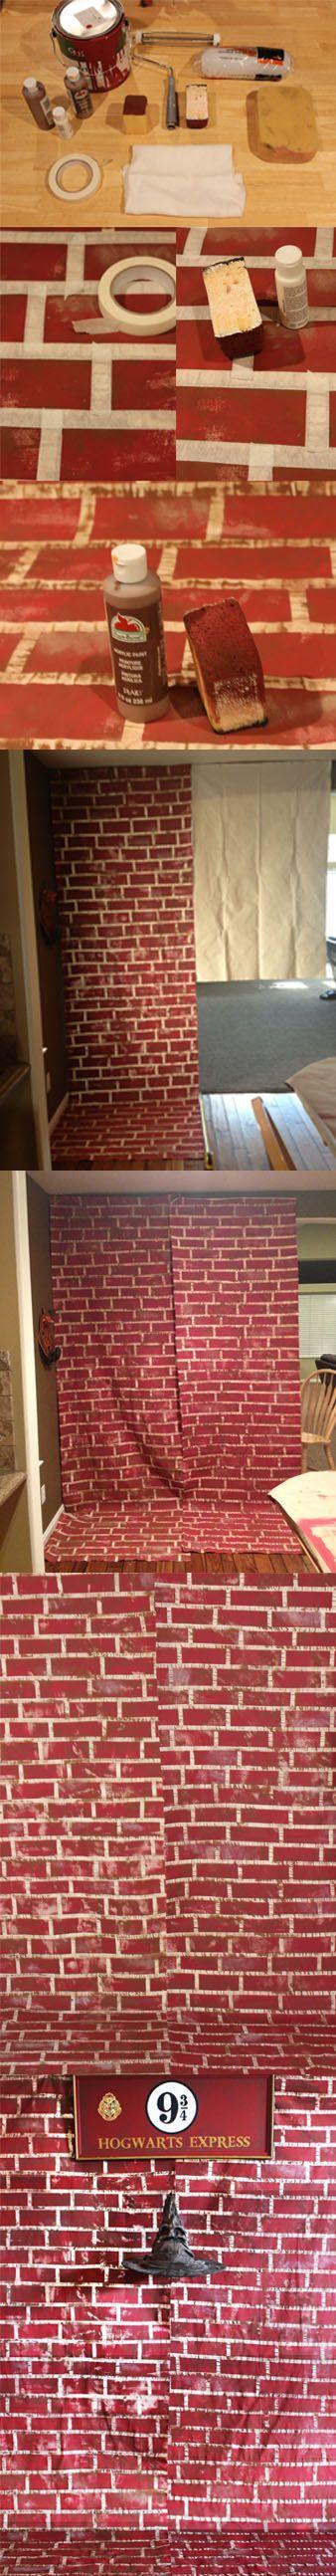 DIY Harry Potter Platform 9 3/4 Brick Wall